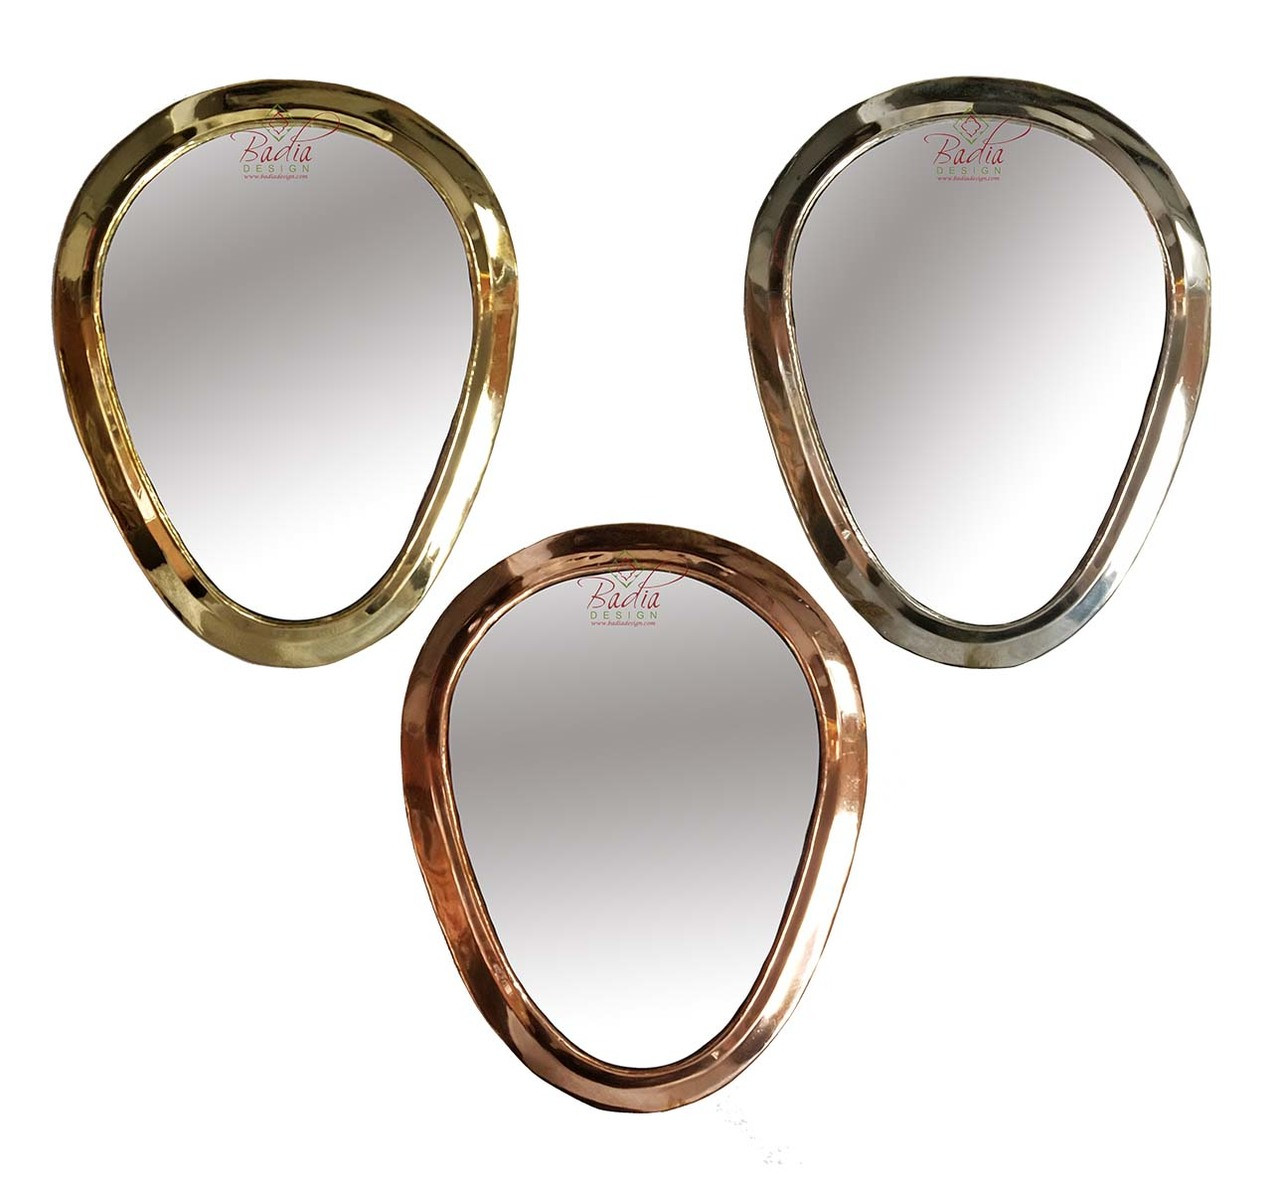 Moroccan Teardrop Shaped Metal Mirrors From Badia Design Inc